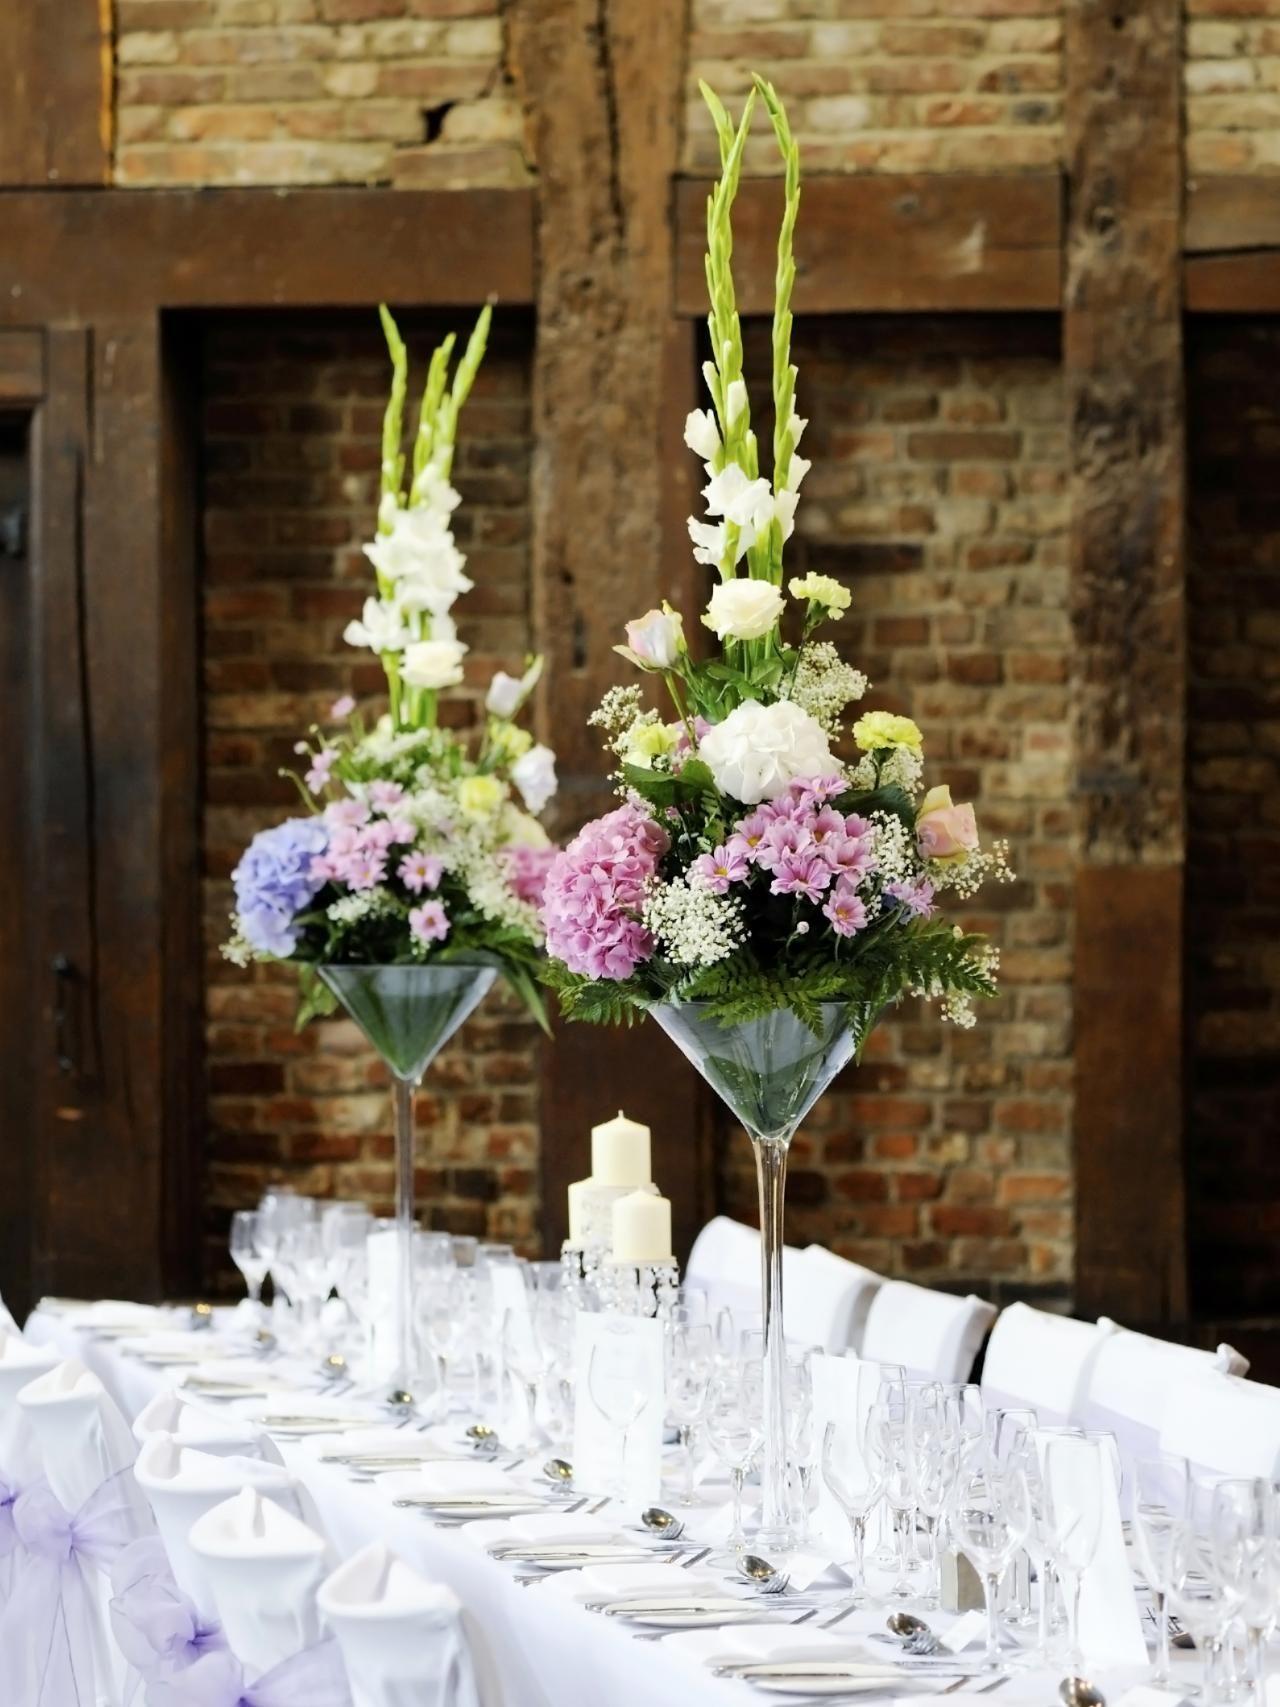 swoonworthy wedding centerpieces for any season diy wedding